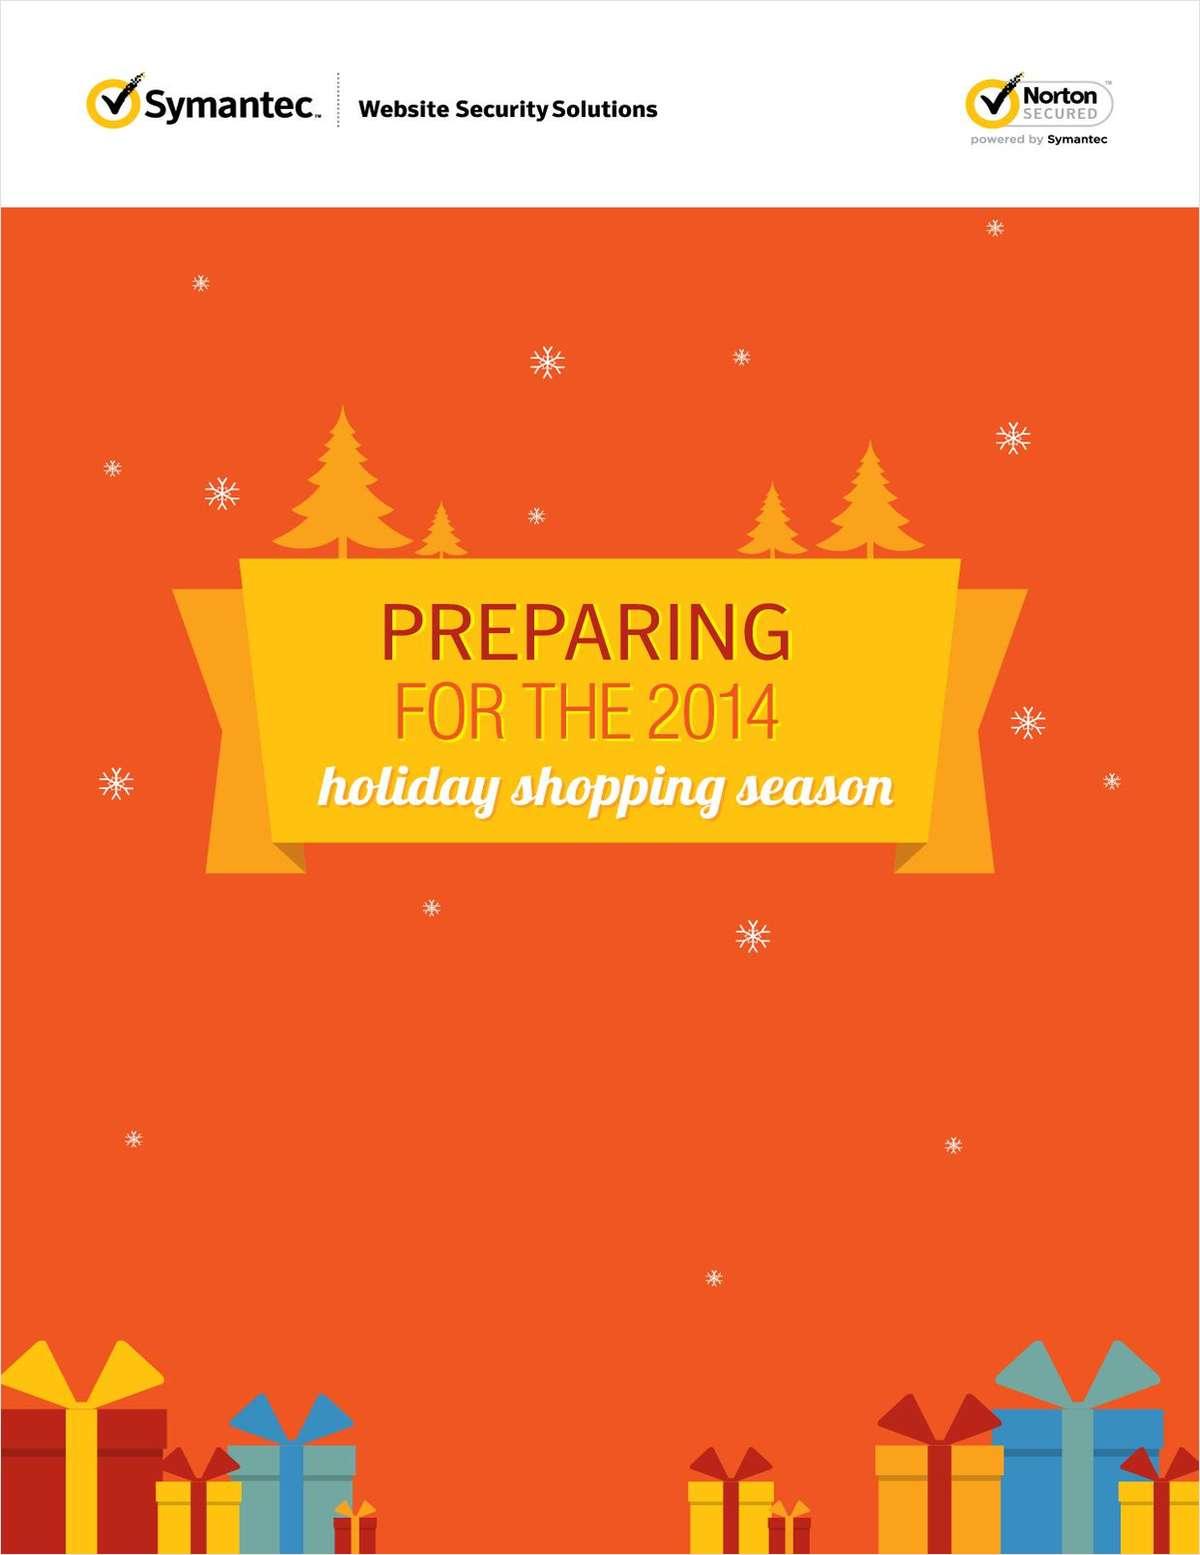 Preparing for the 2014 Holiday Shopping Season